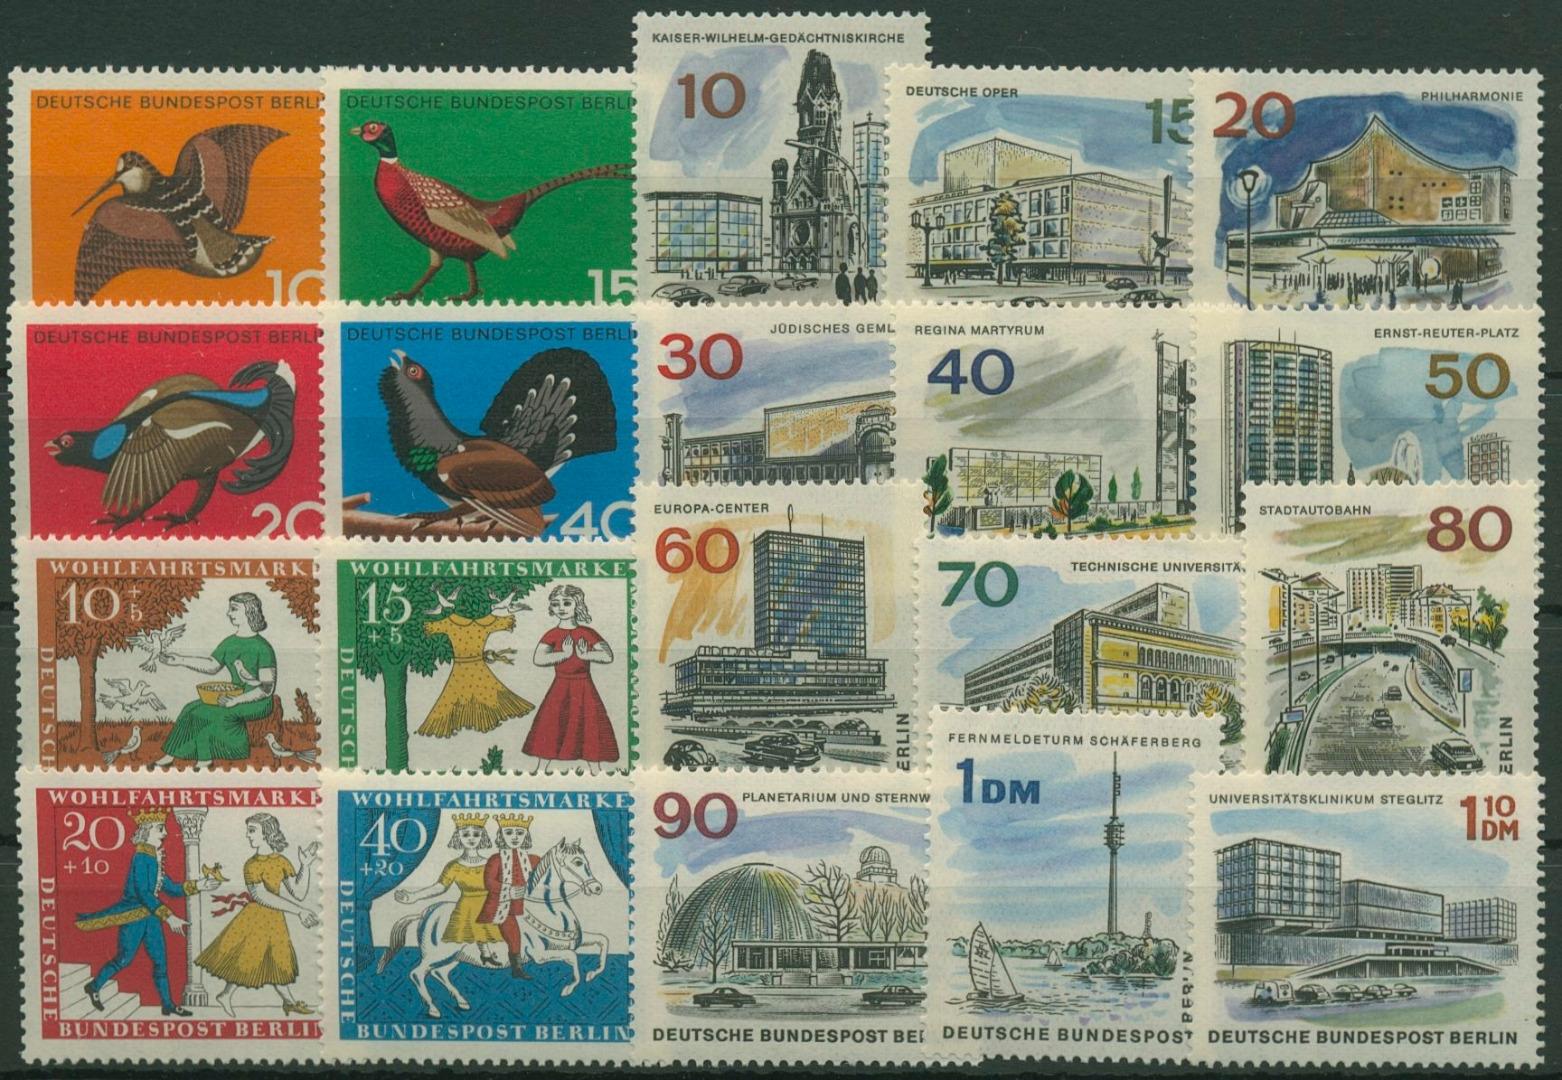 Berlin Jahrgang 1965 Komplett Postfrisch G6478 Briefmarken Dr